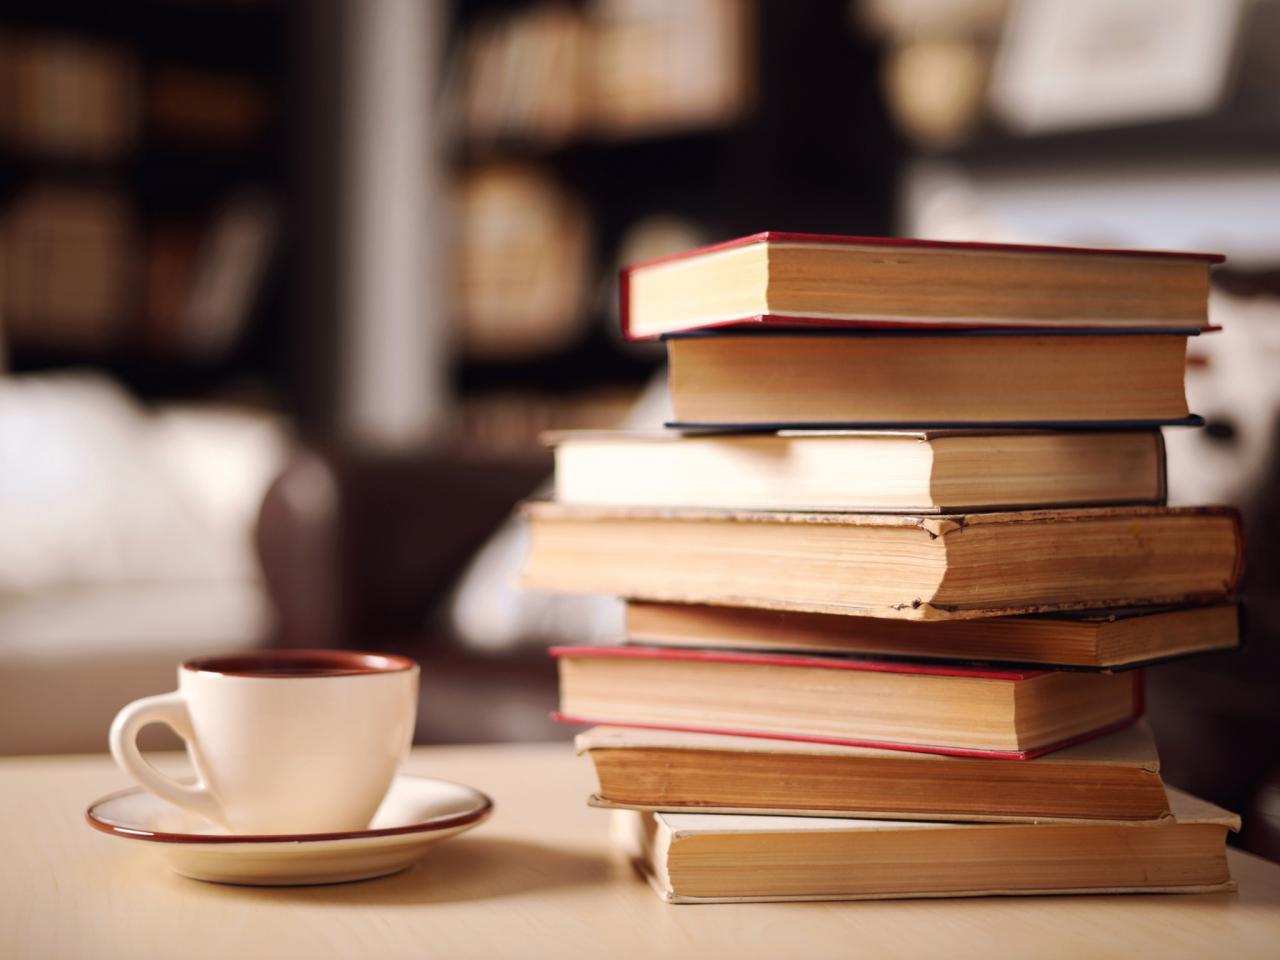 Books we read. Part II